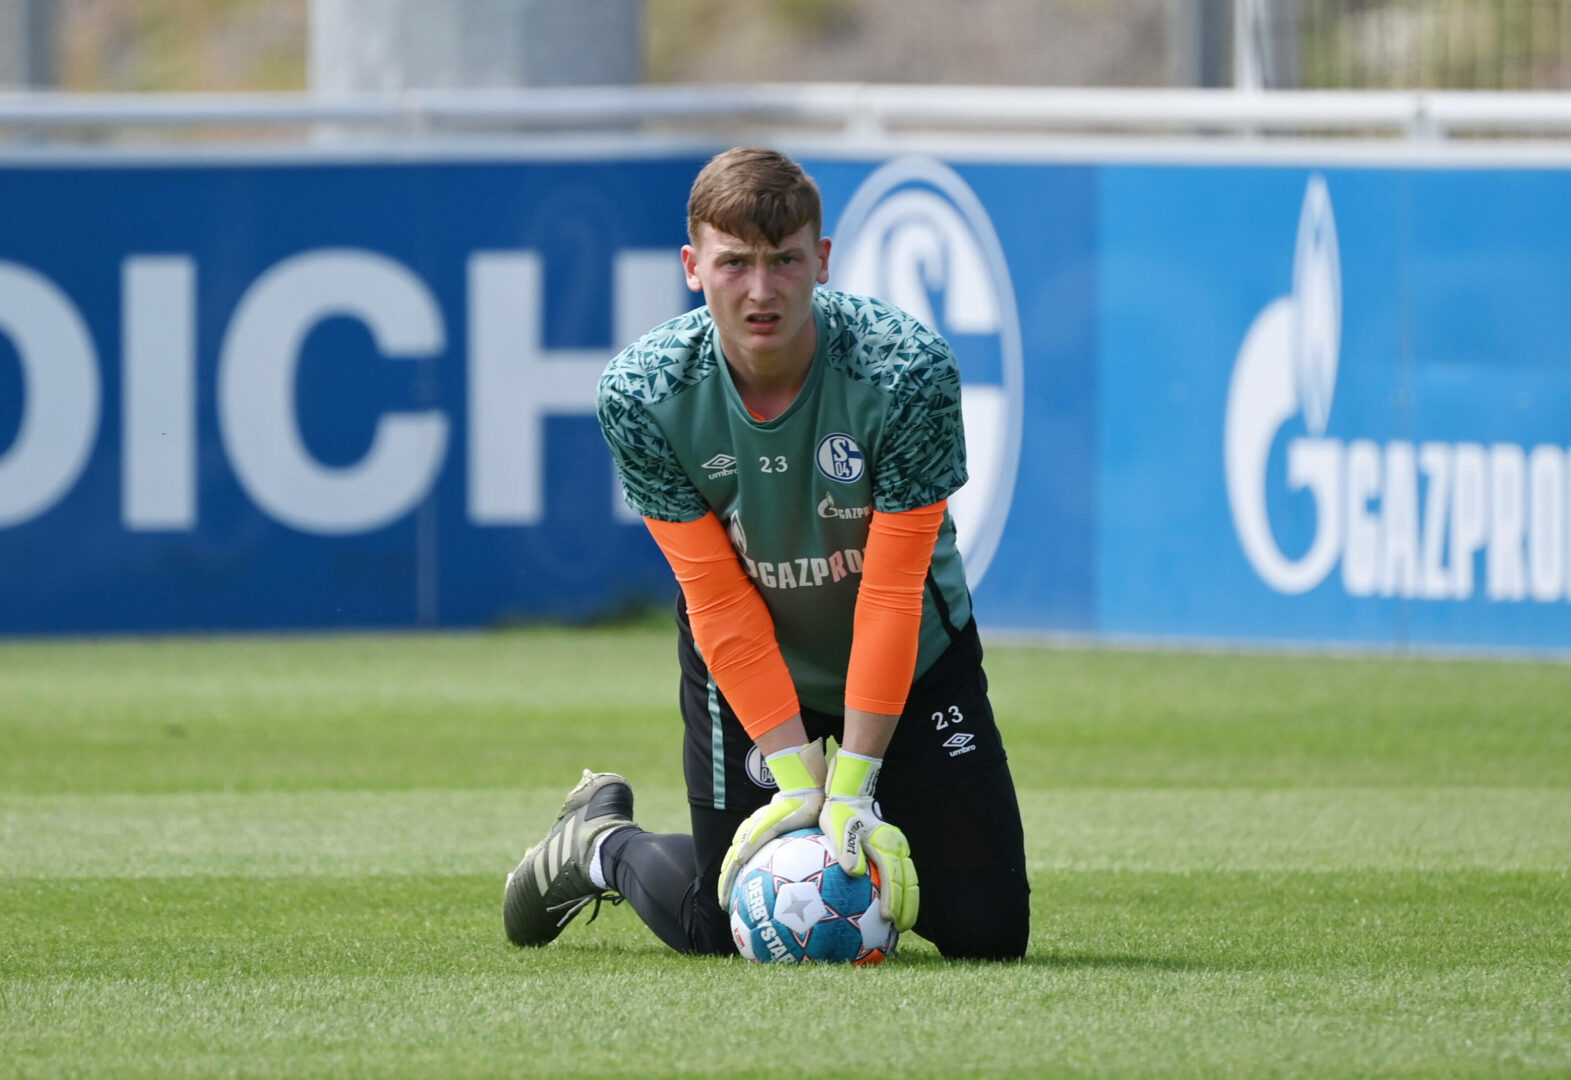 Schalke | Wechsel nach Arnheim: Schubert-Abgang steht bevor